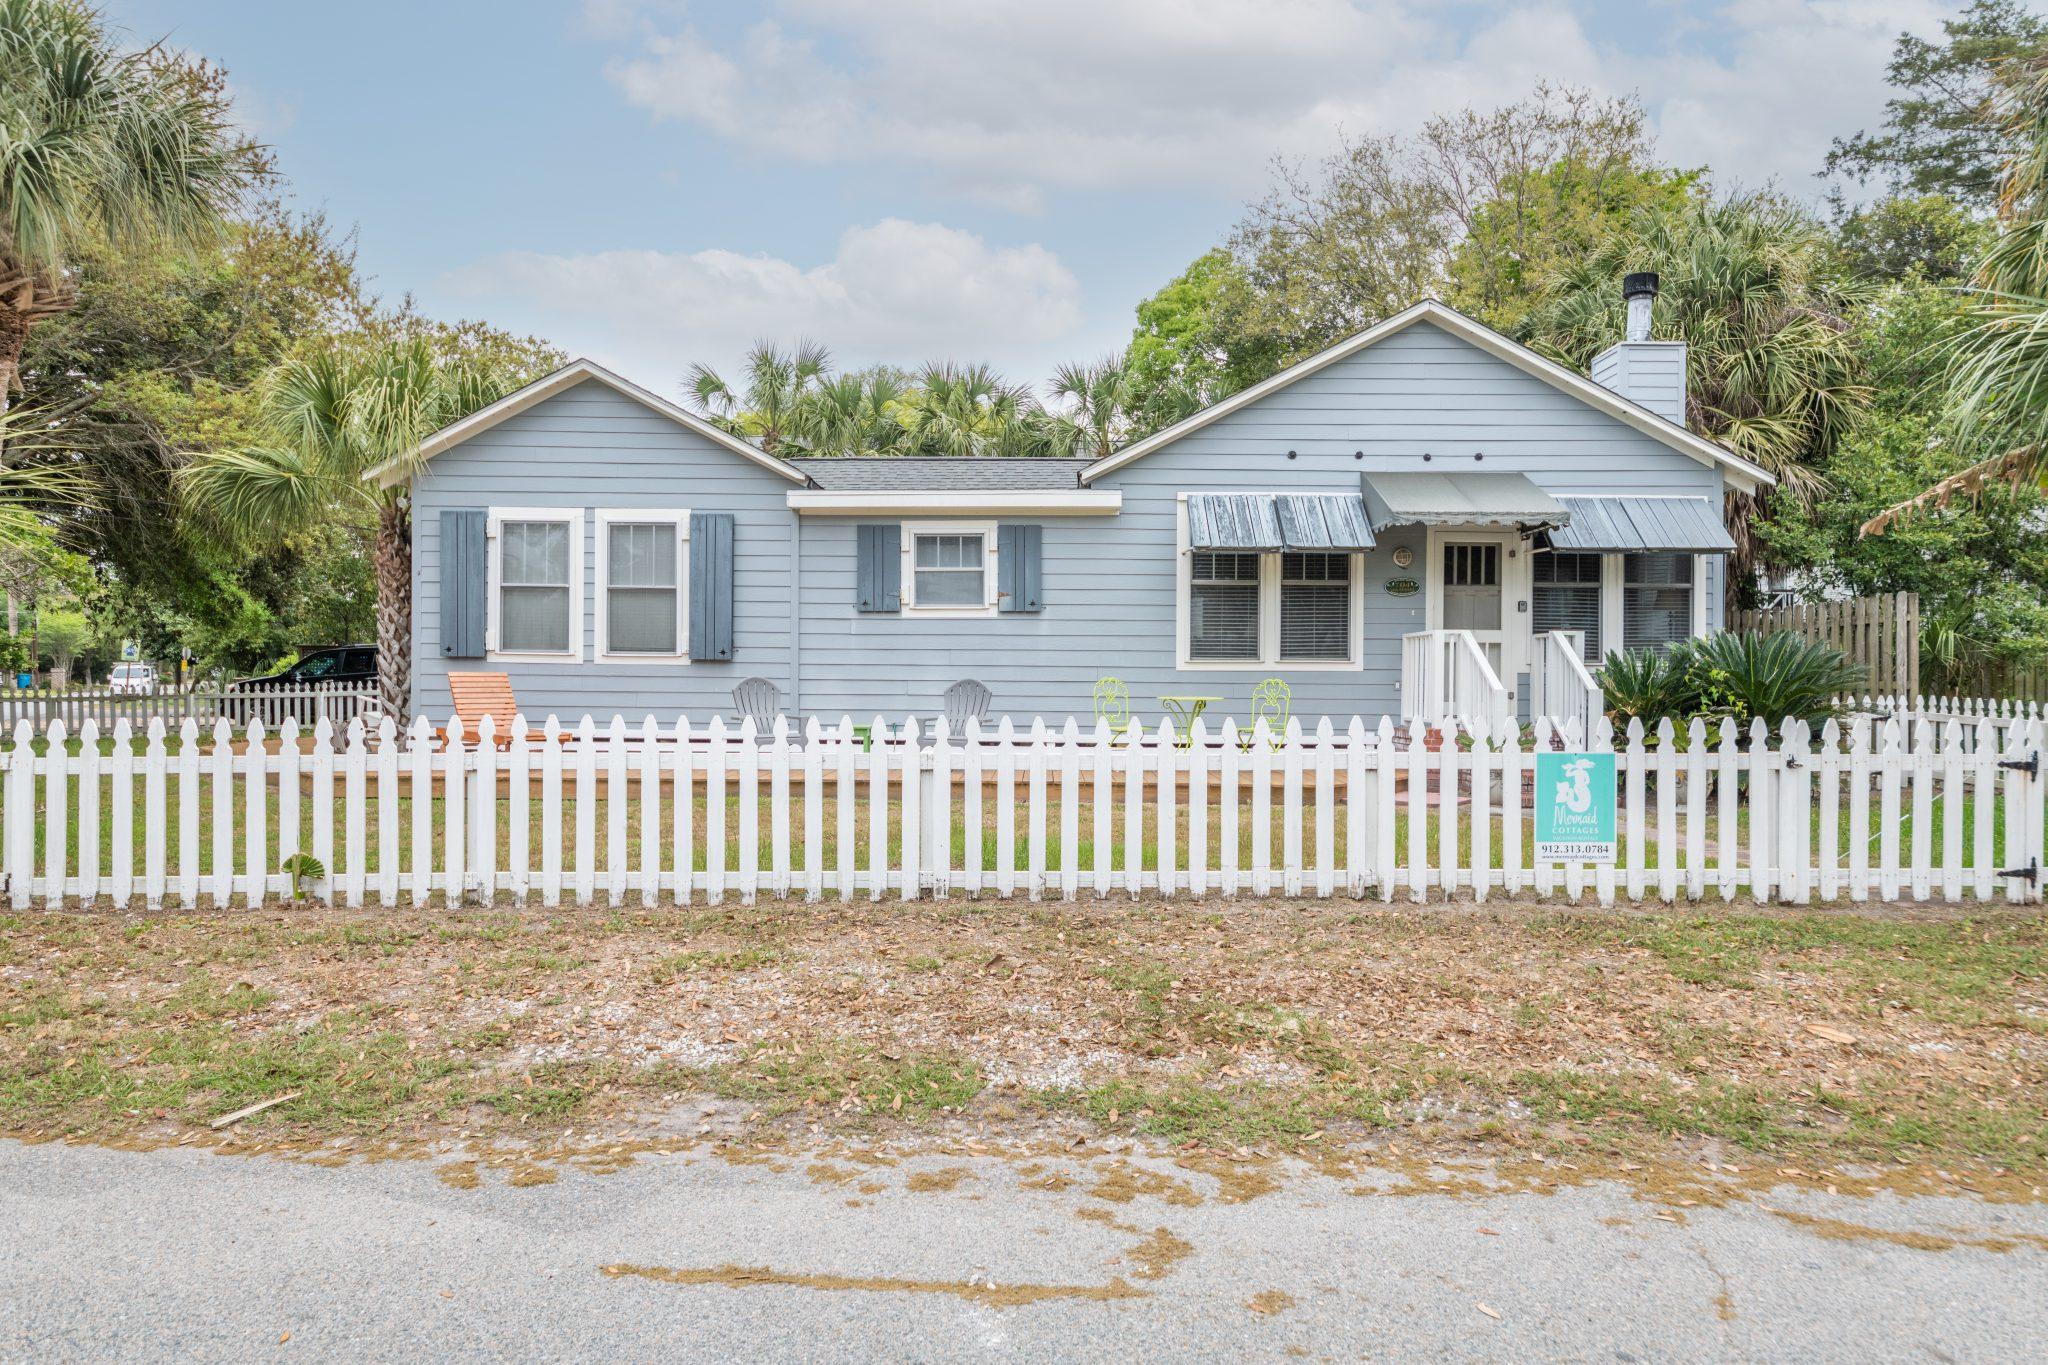 blue heron cottage exterior